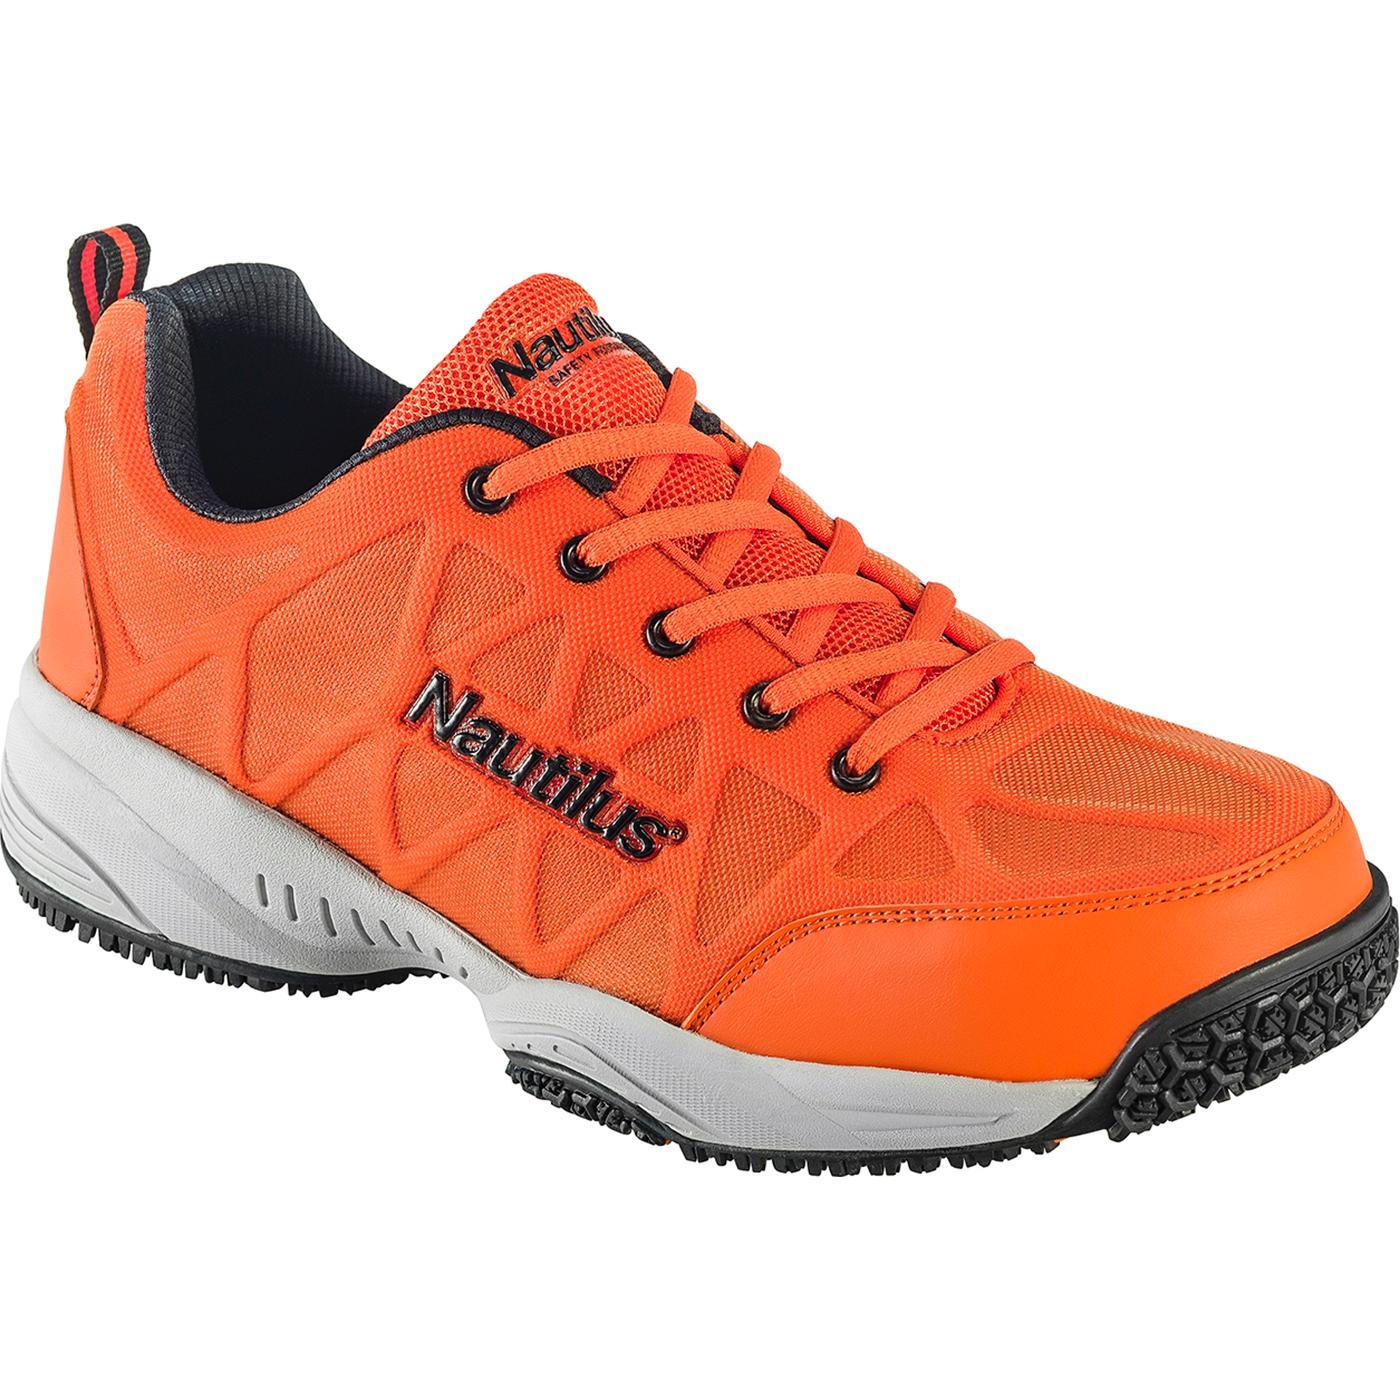 Kodiak Steel Toe Running Shoes